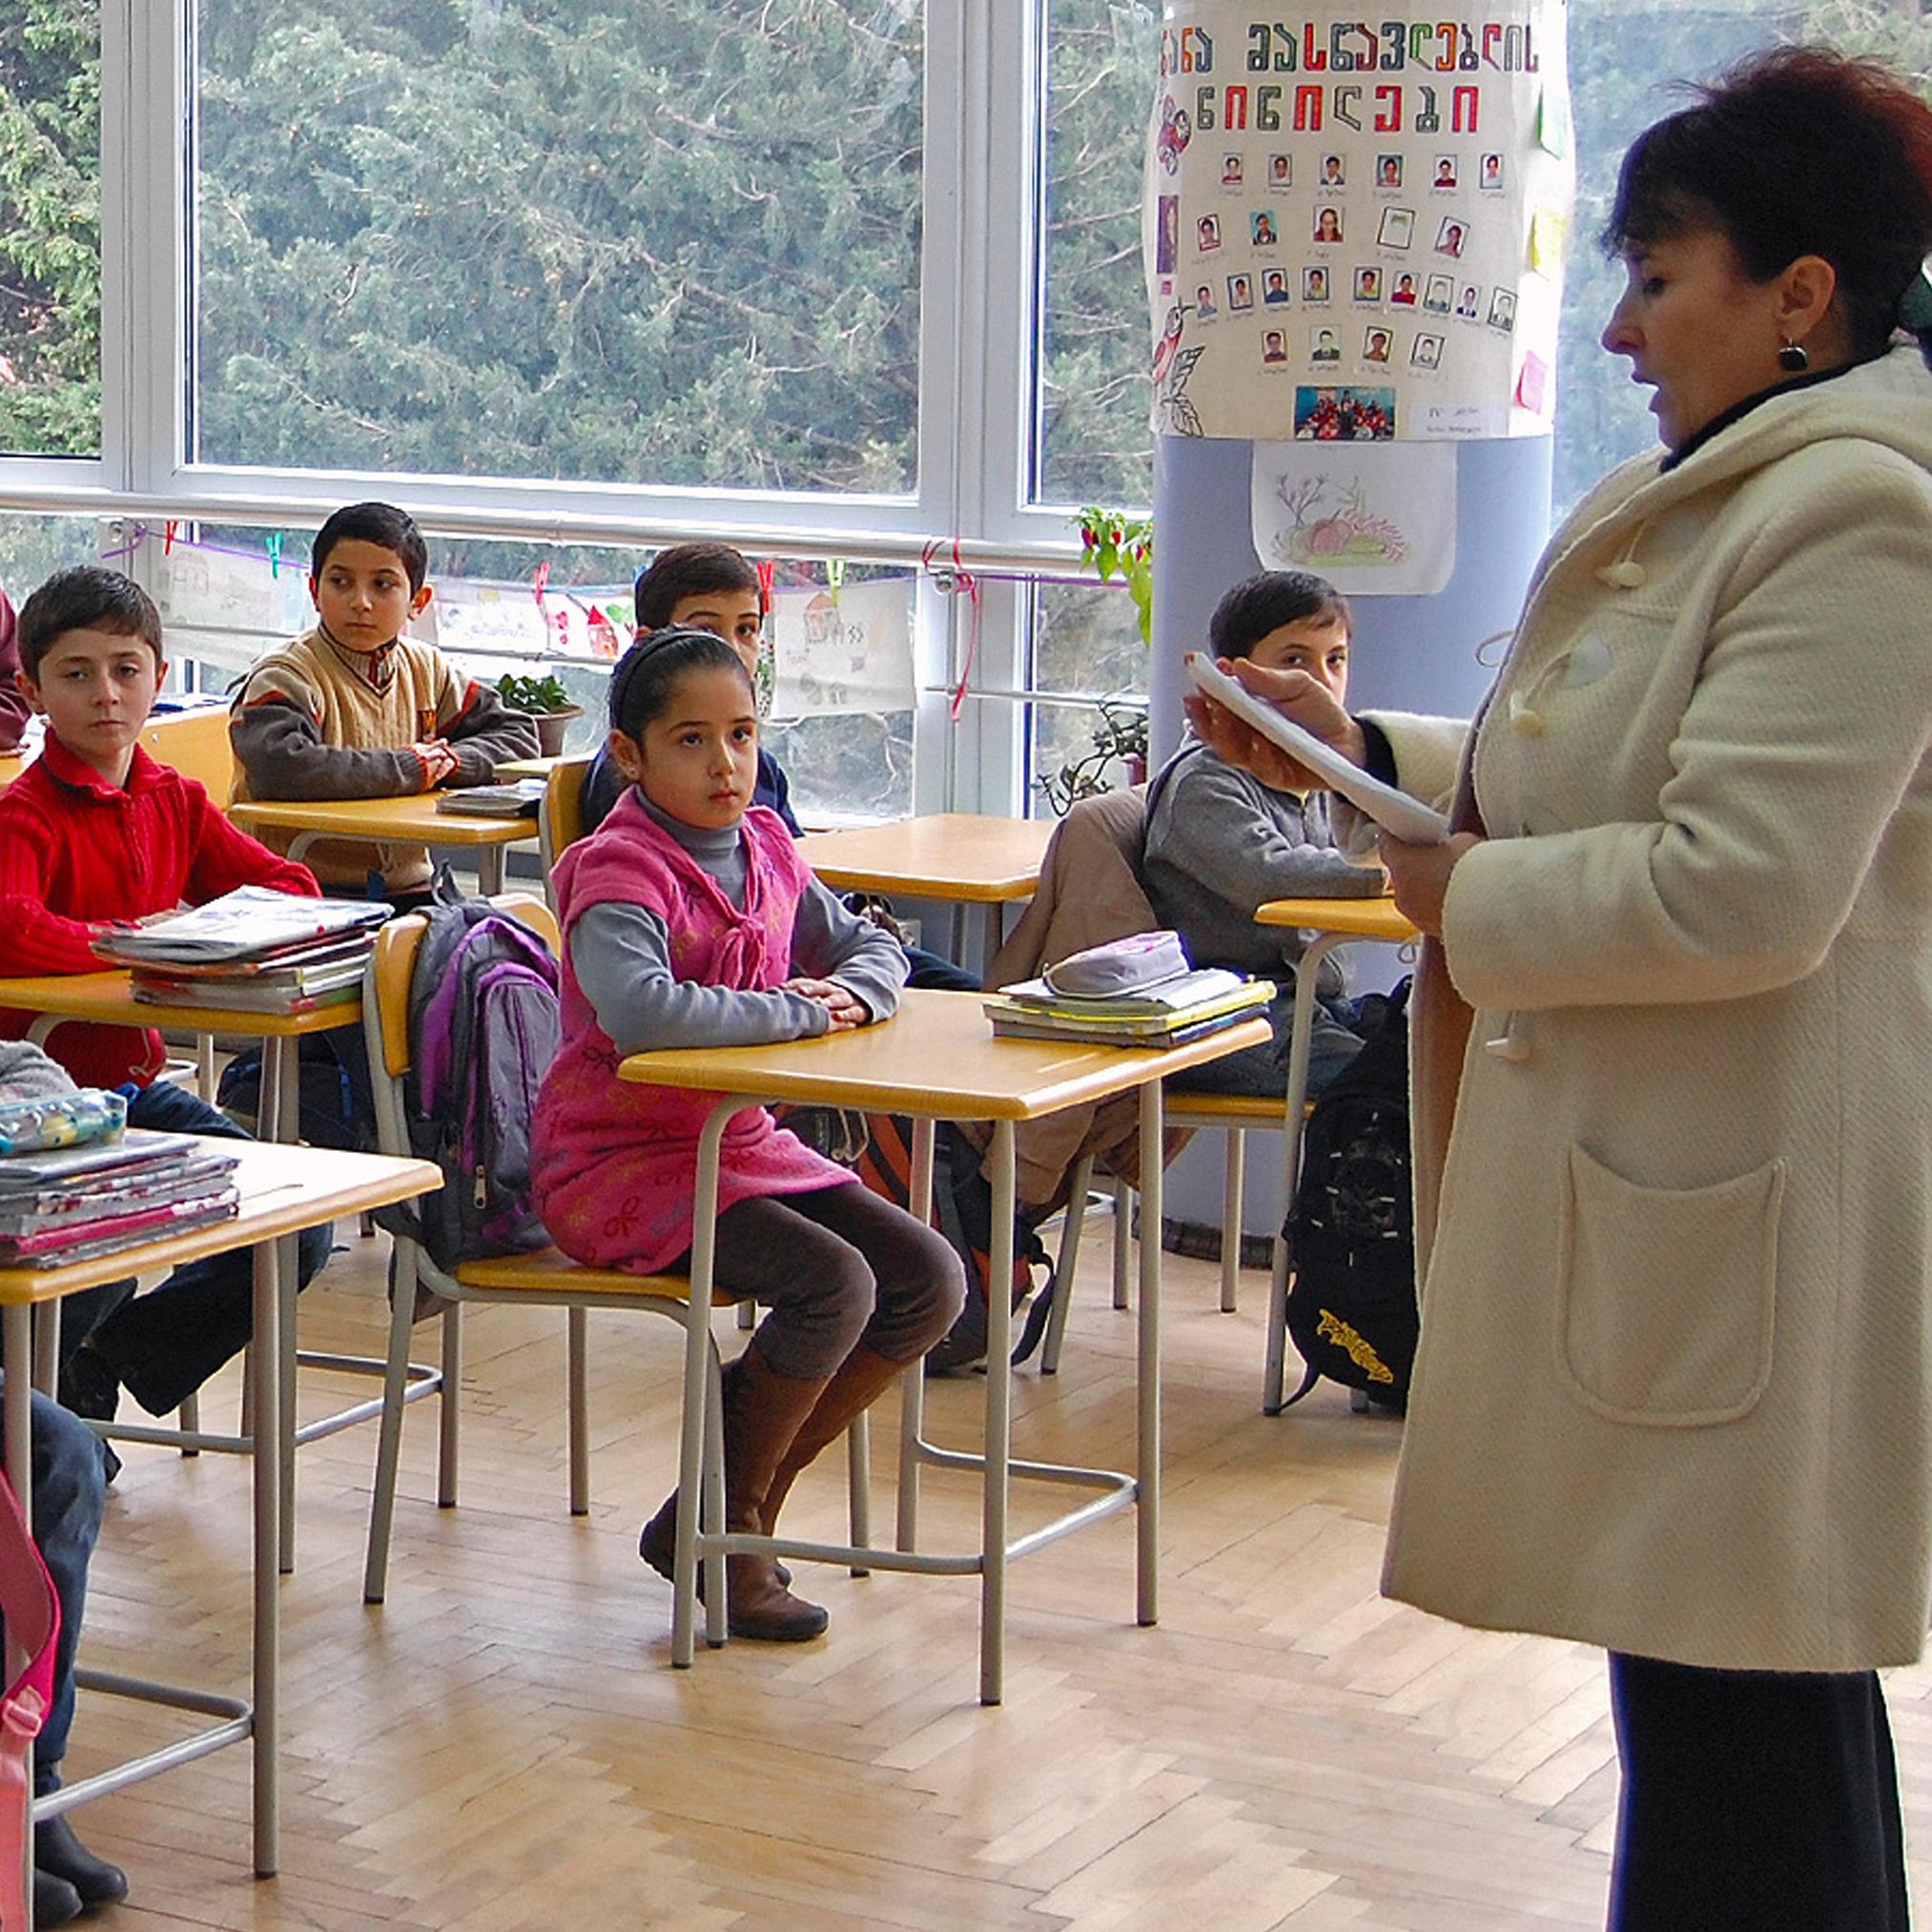 A school classroom in Georgia.